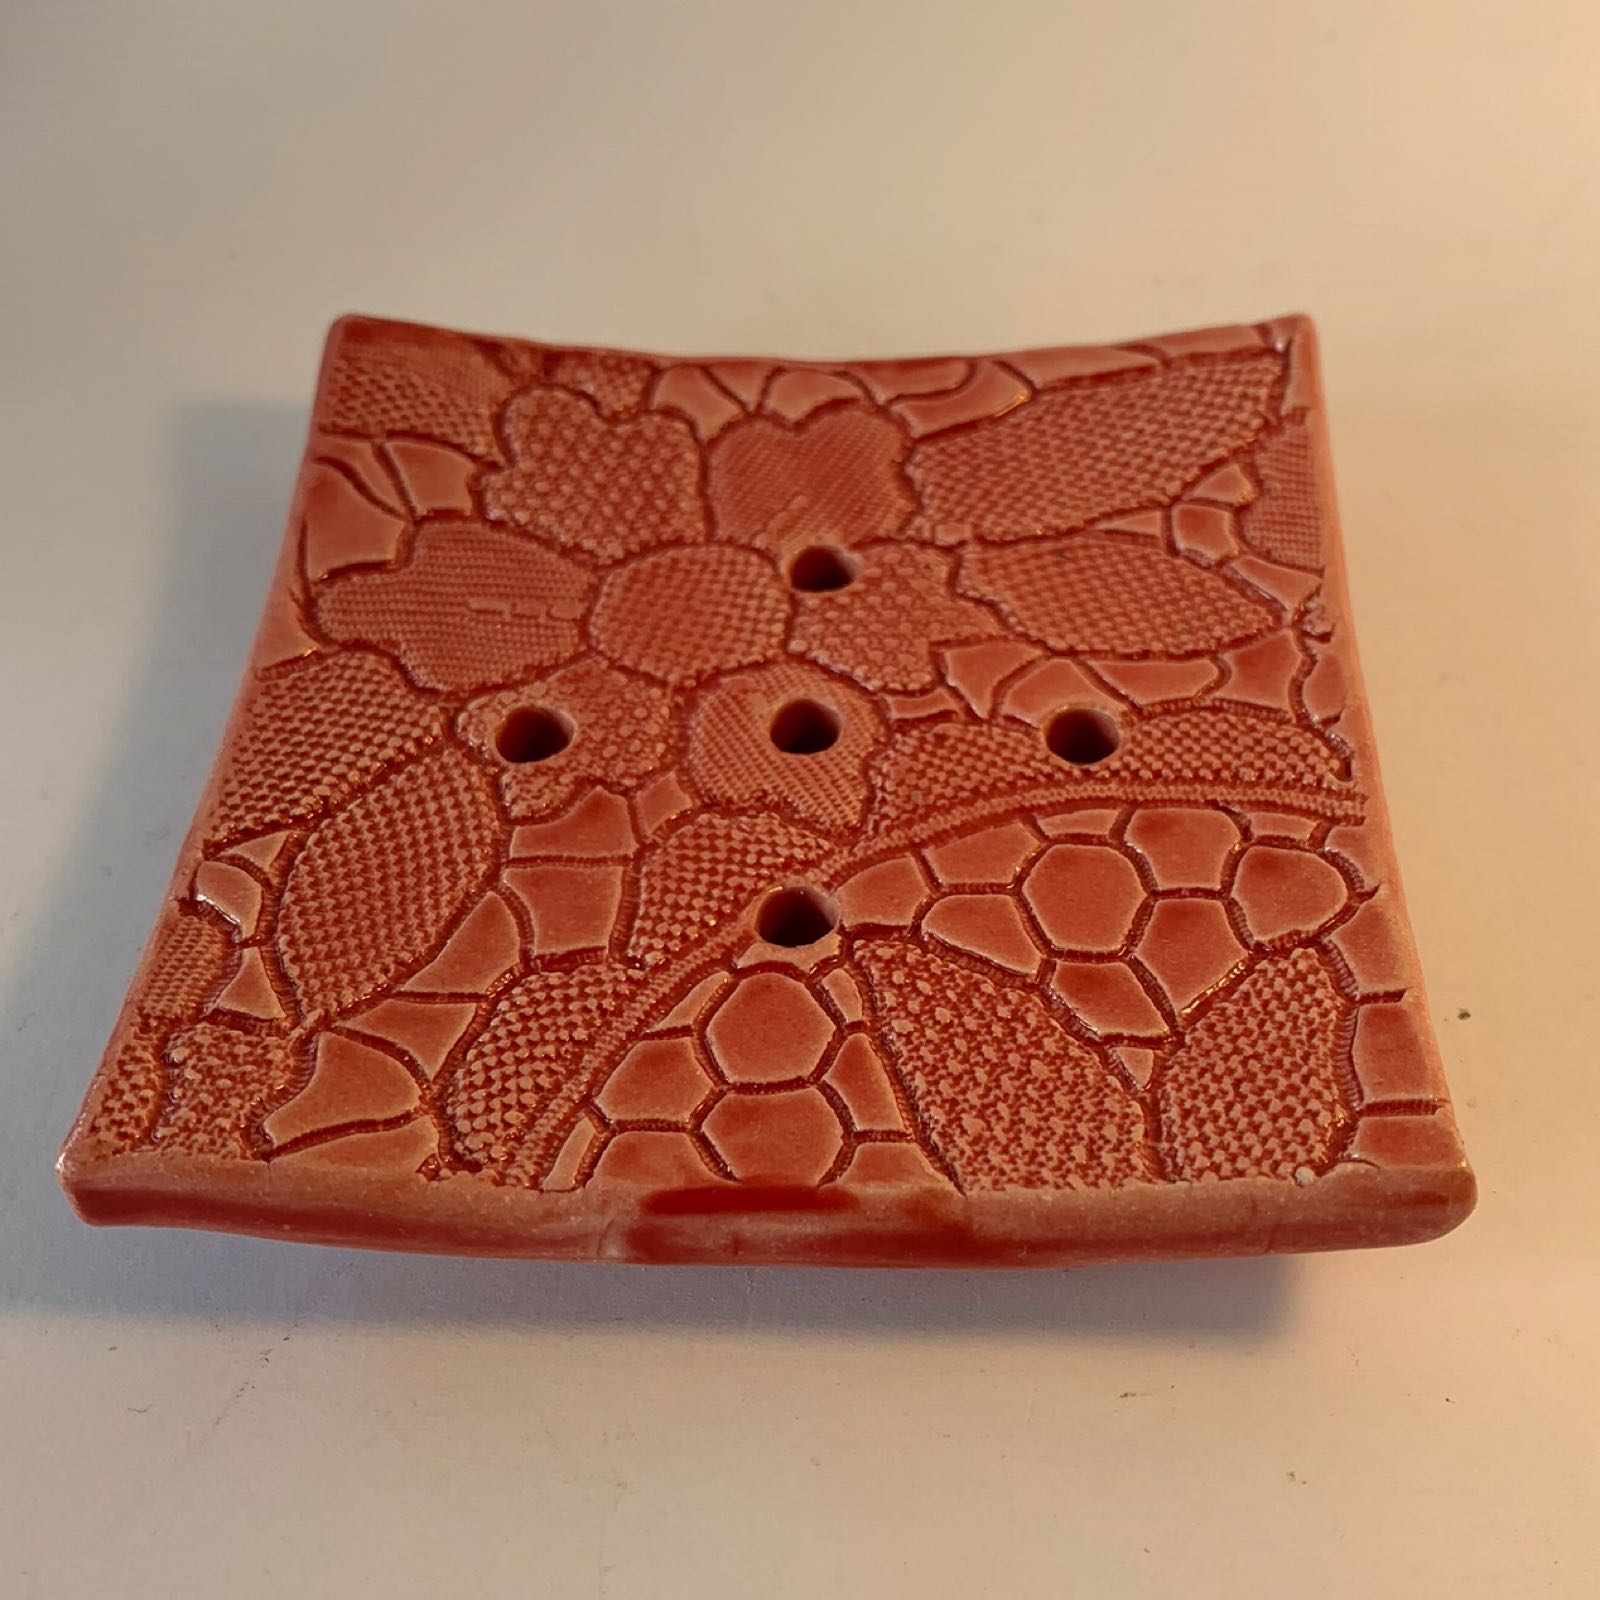 Ceramic Square Soap Dish - Red